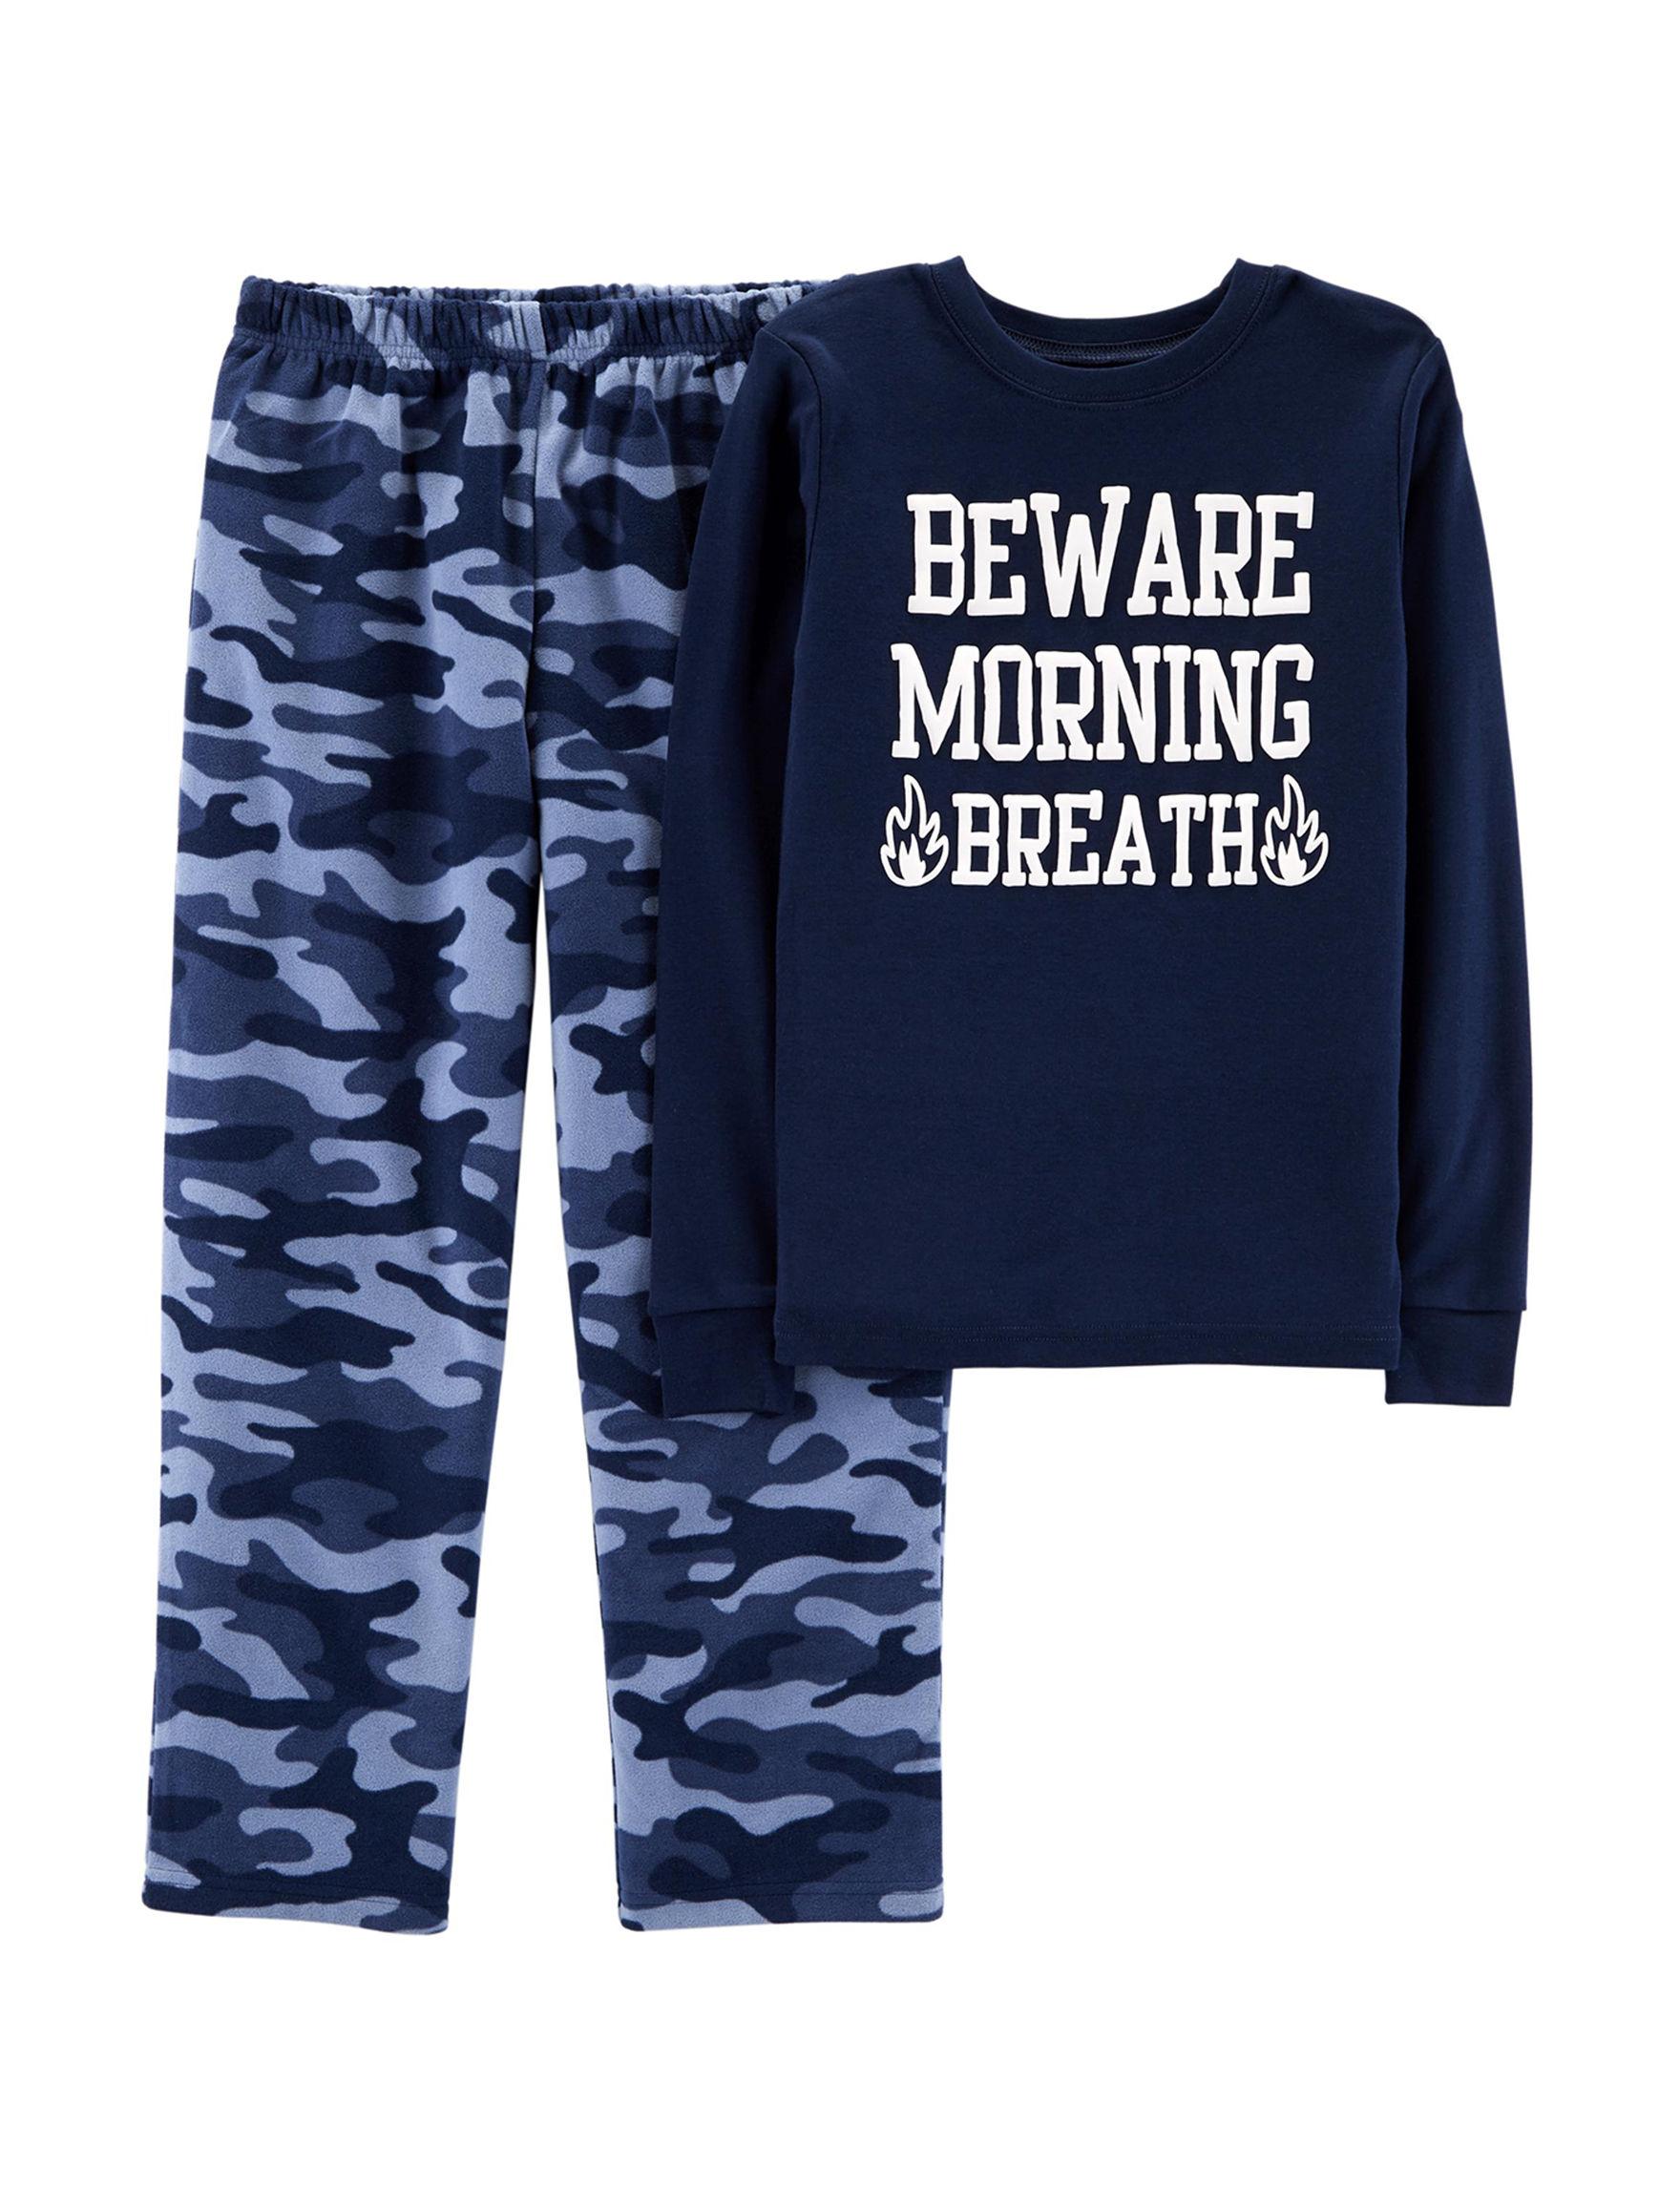 Carter's Navy / Blue Pajama Sets